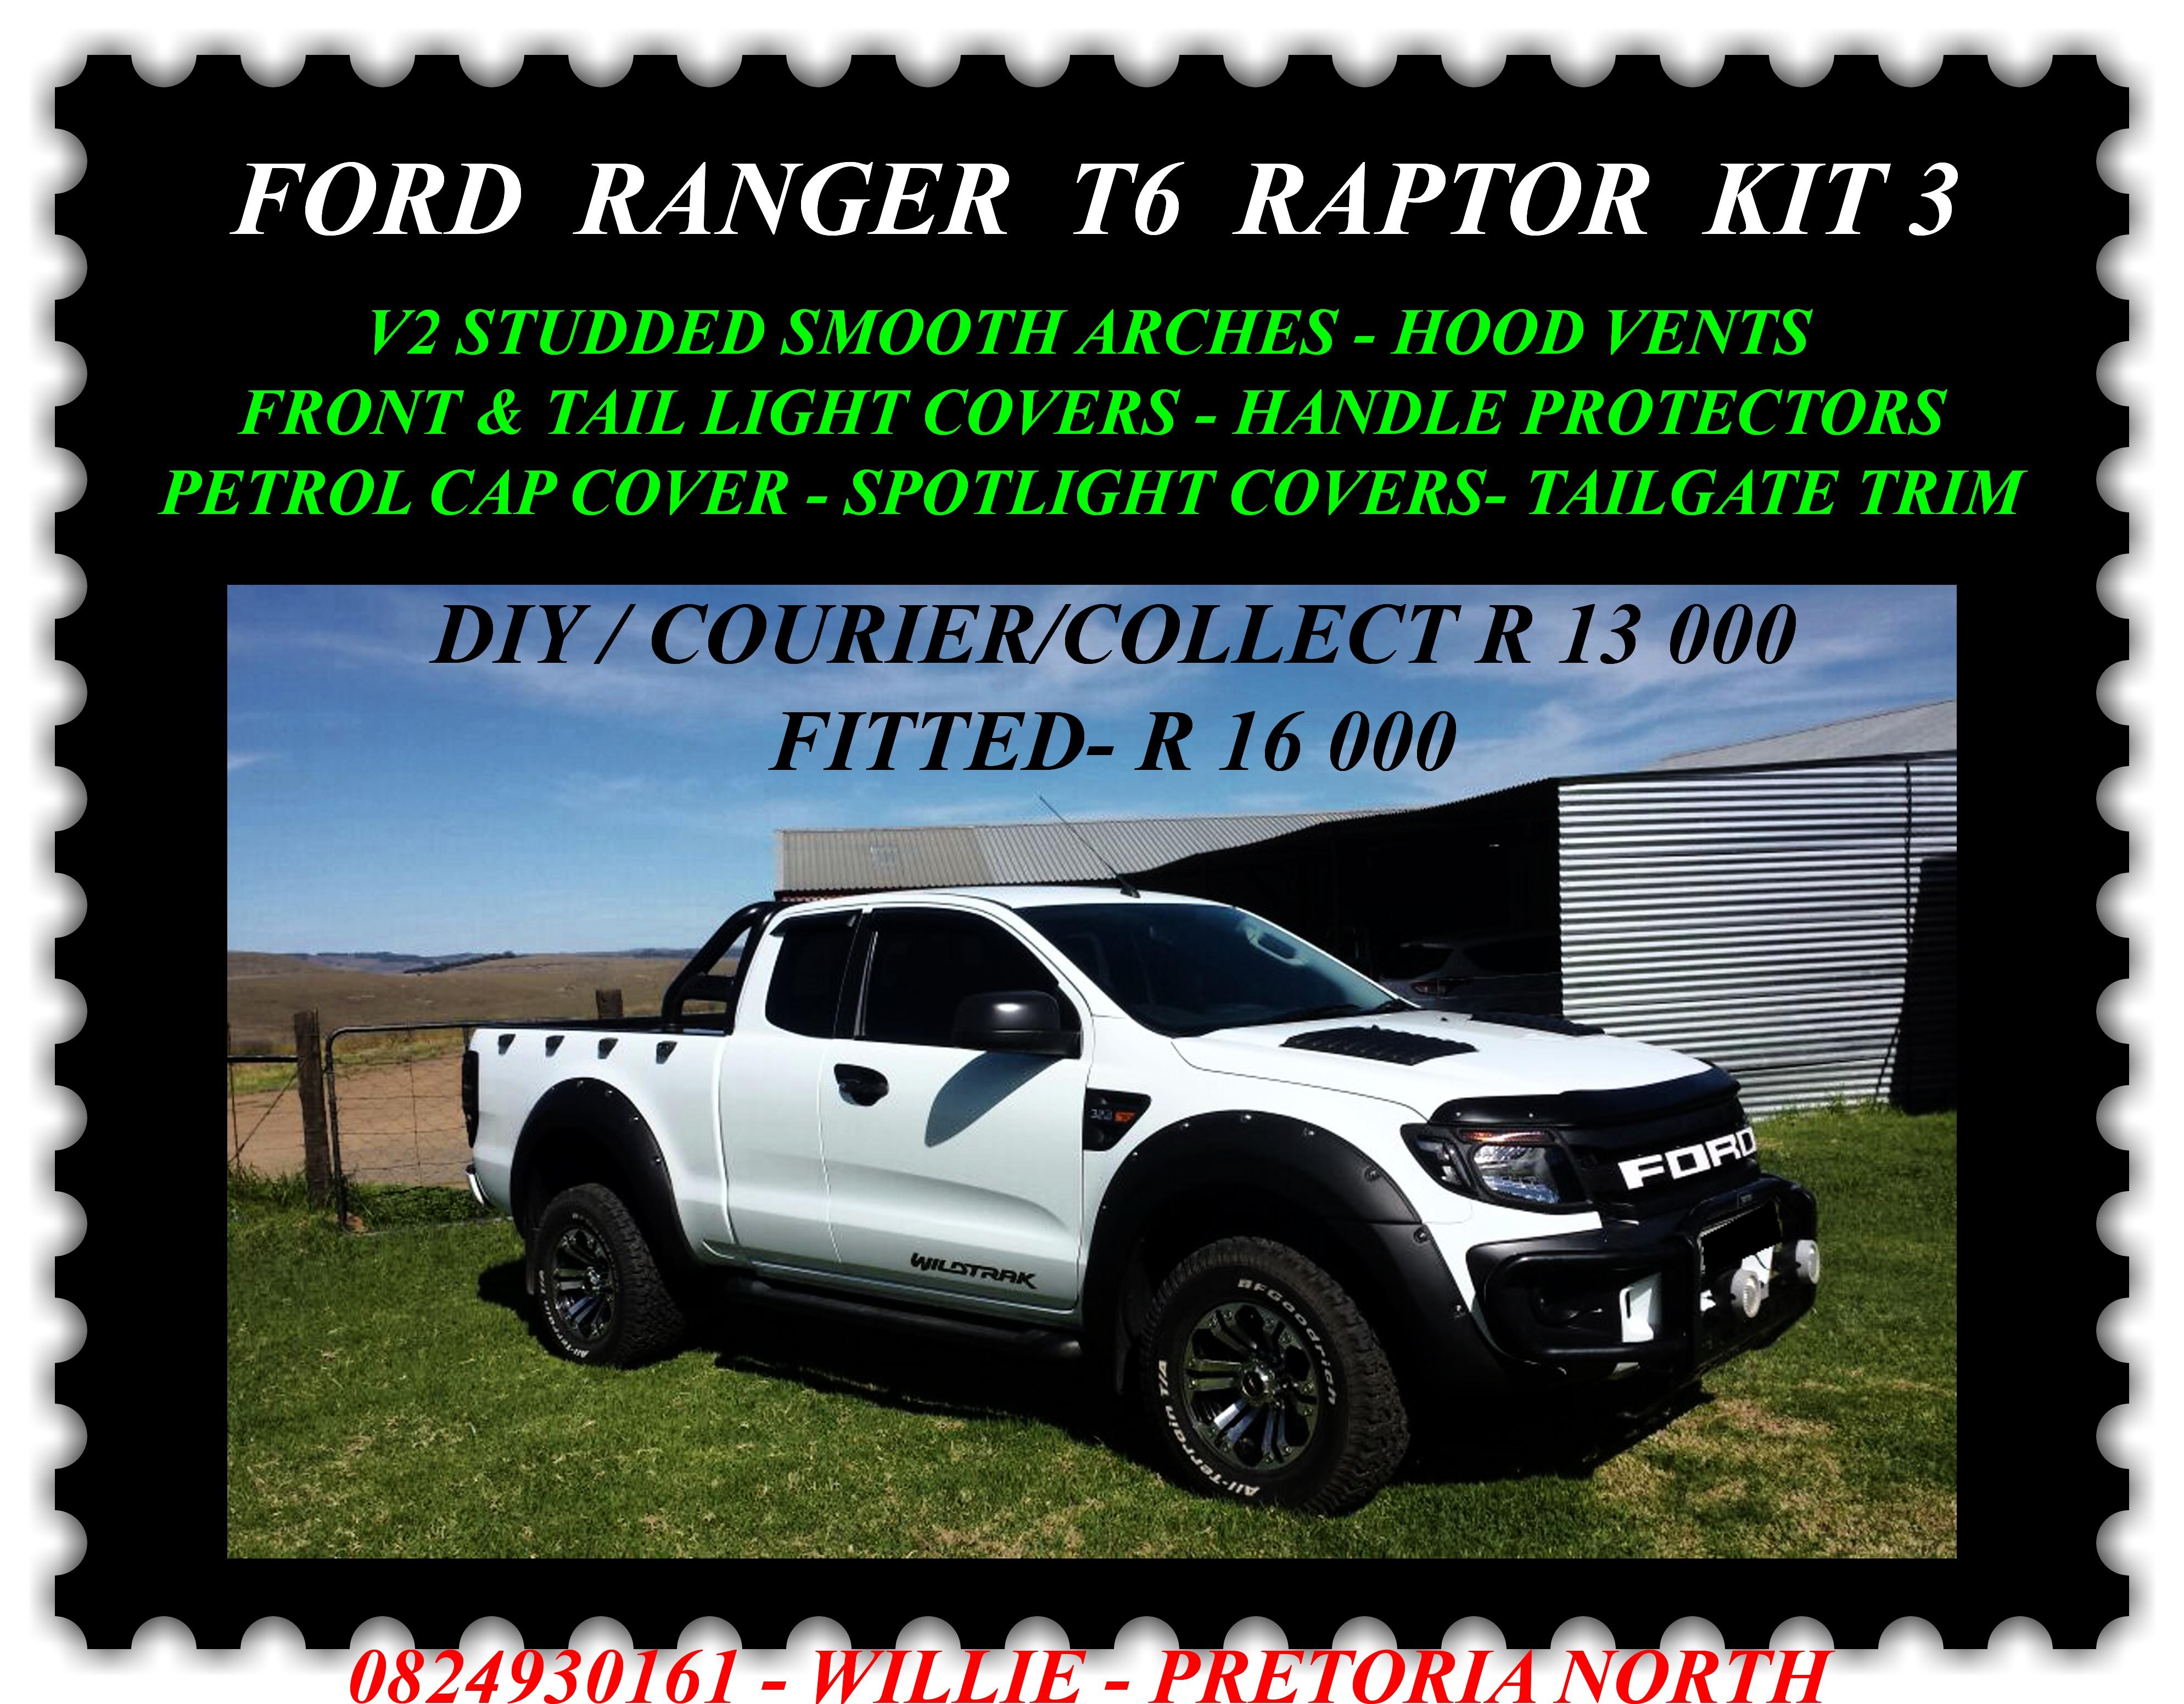 Raptor kit 3 special